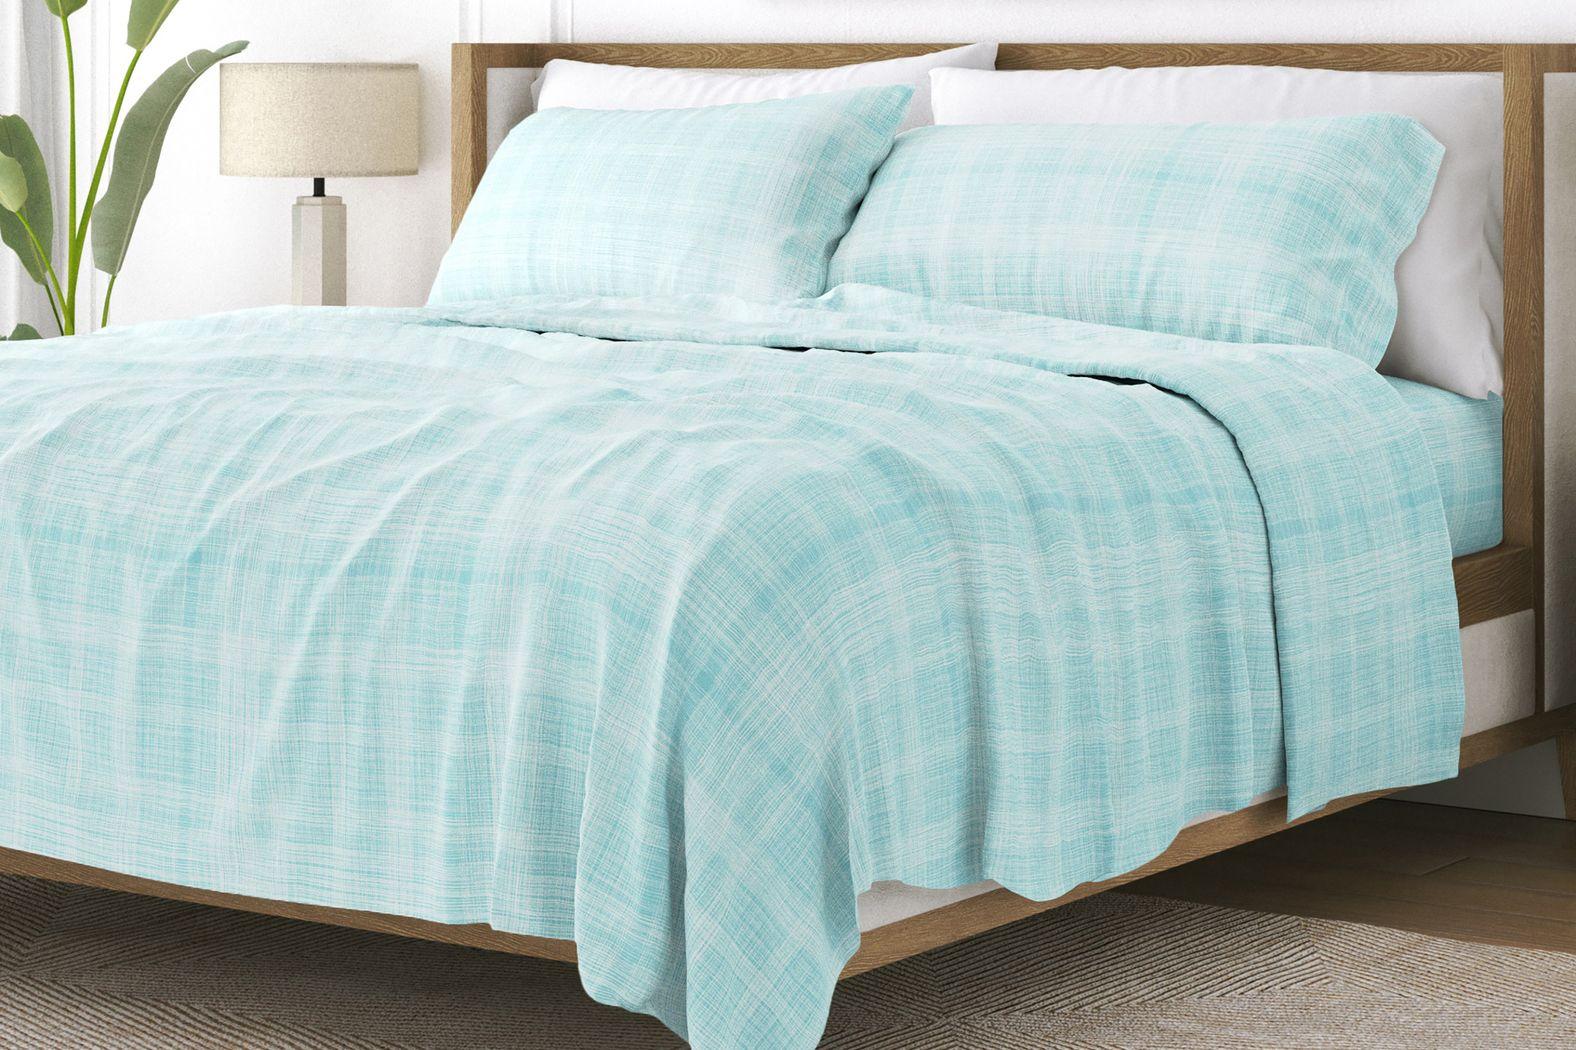 Belden Landing IX Blue 4 Pc King Bed Sheet Set